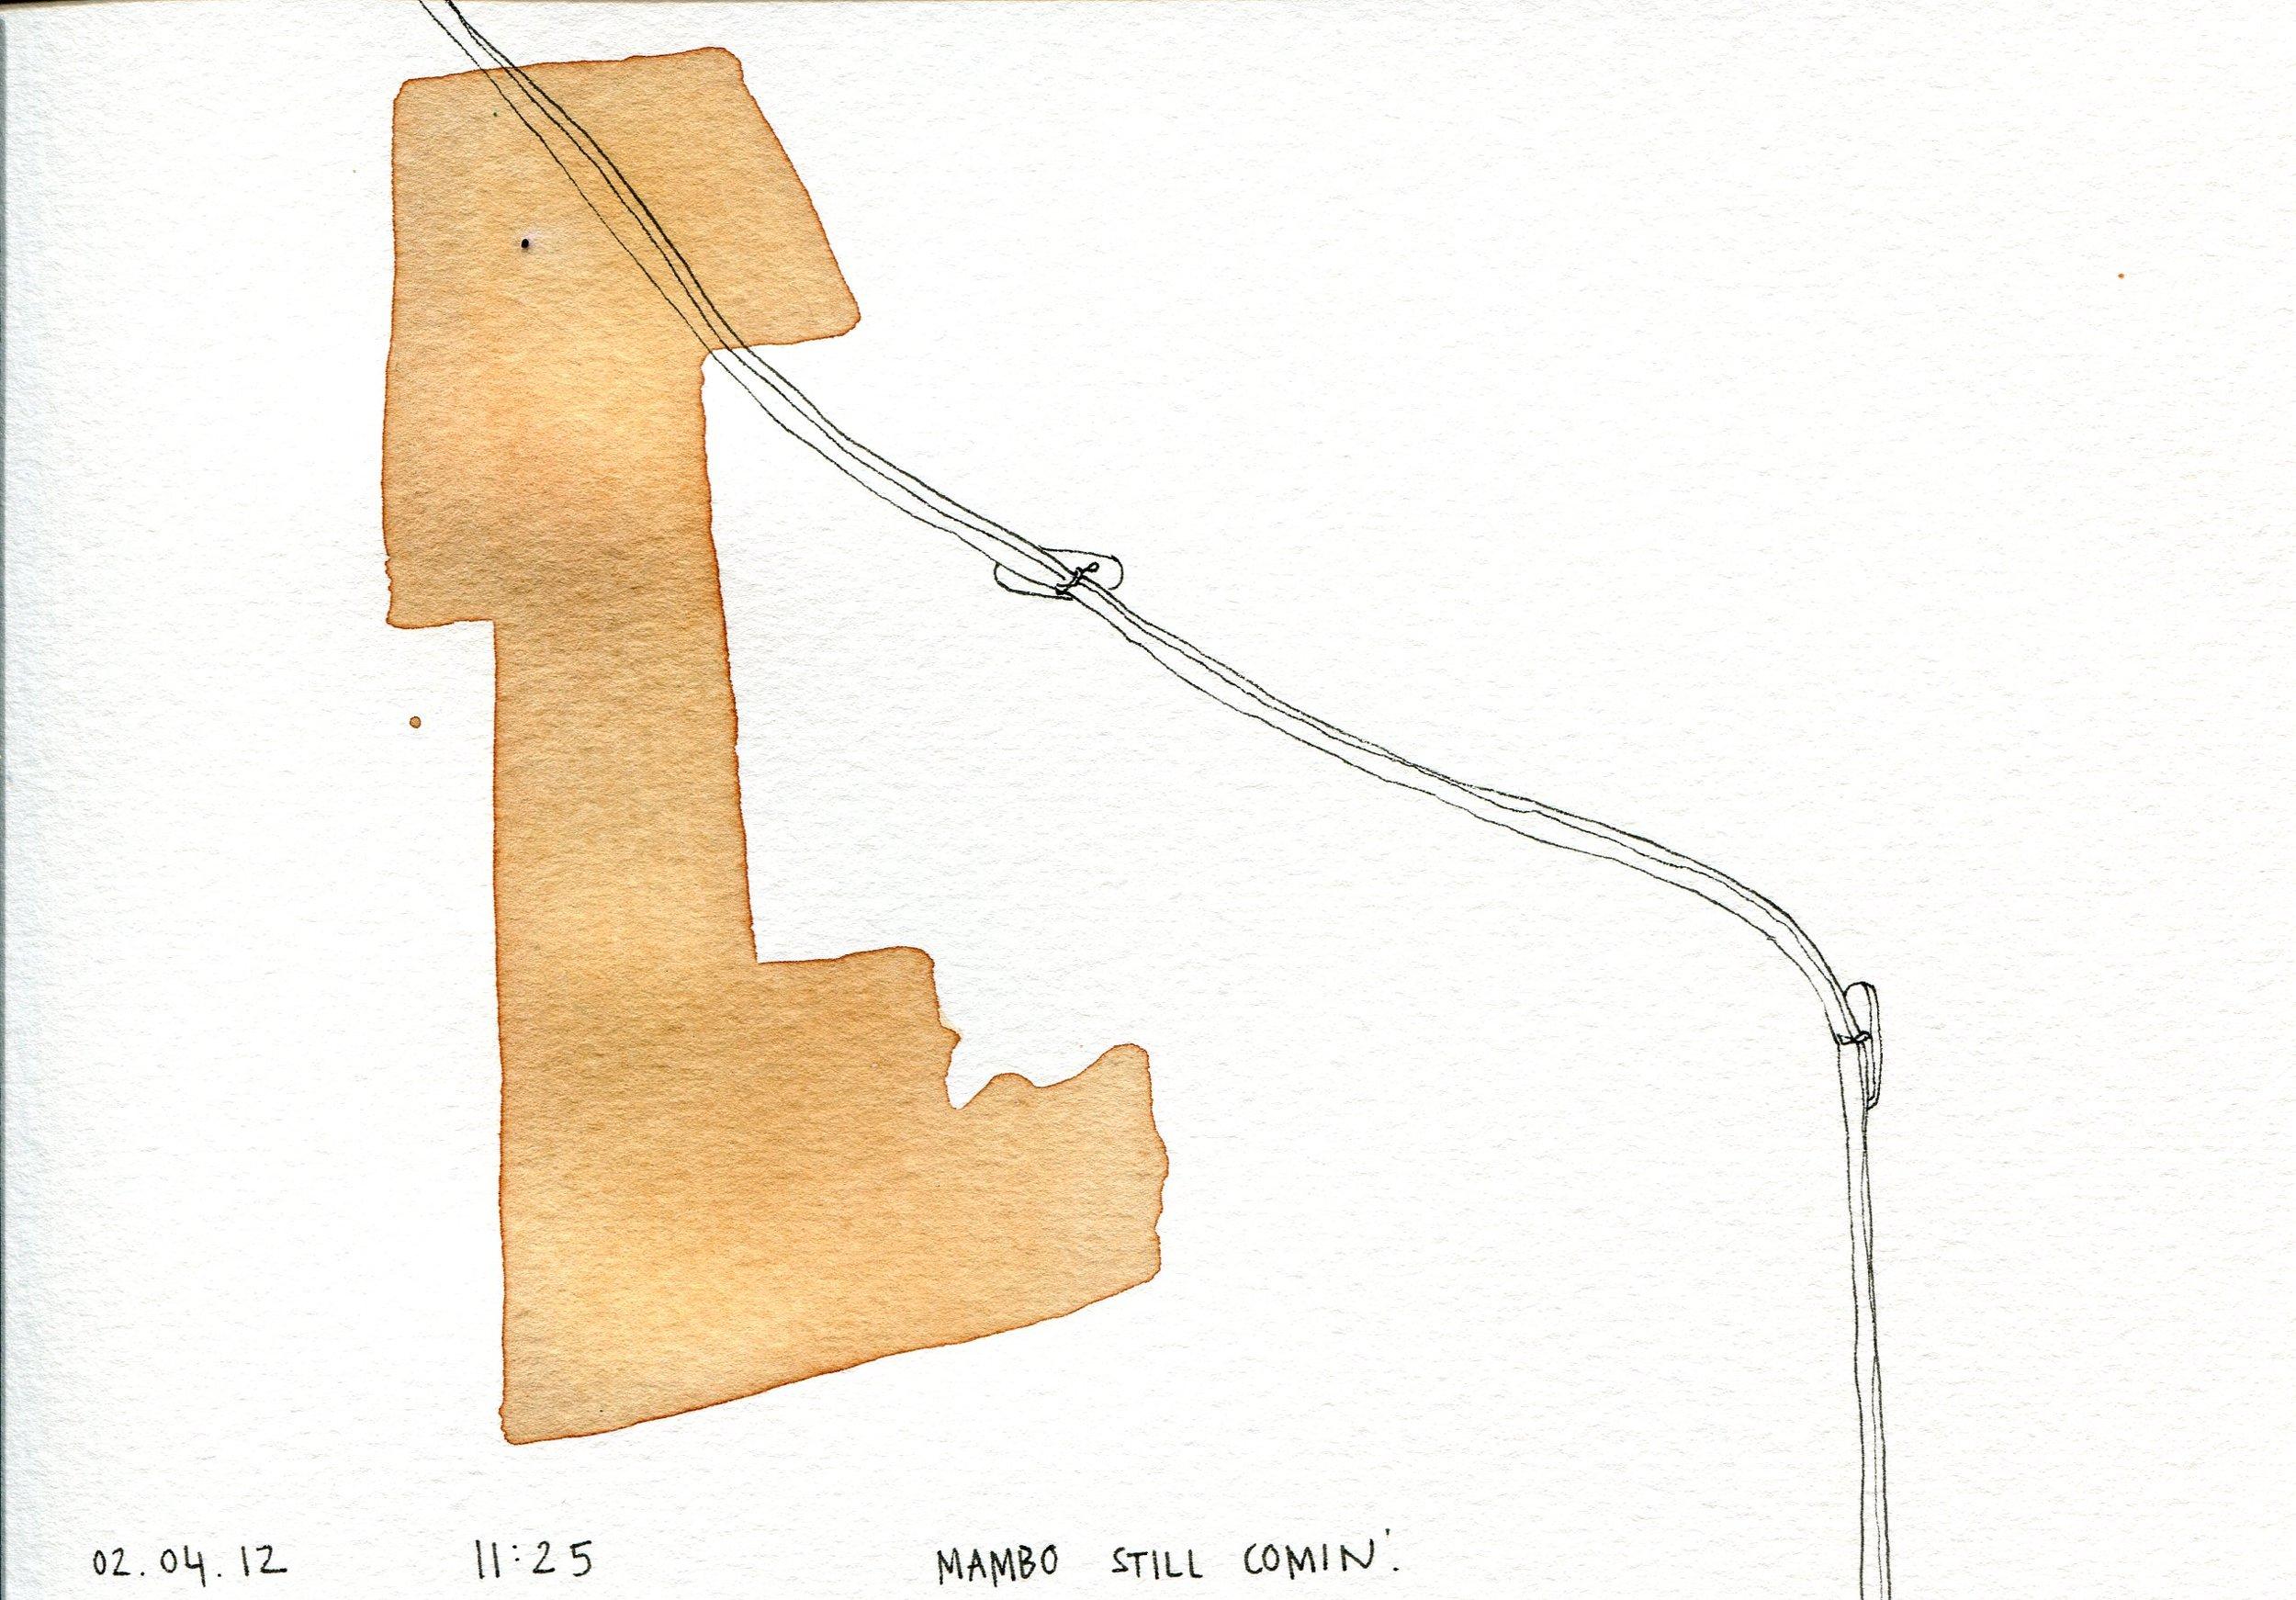 2012-02-04 drawing007.jpg